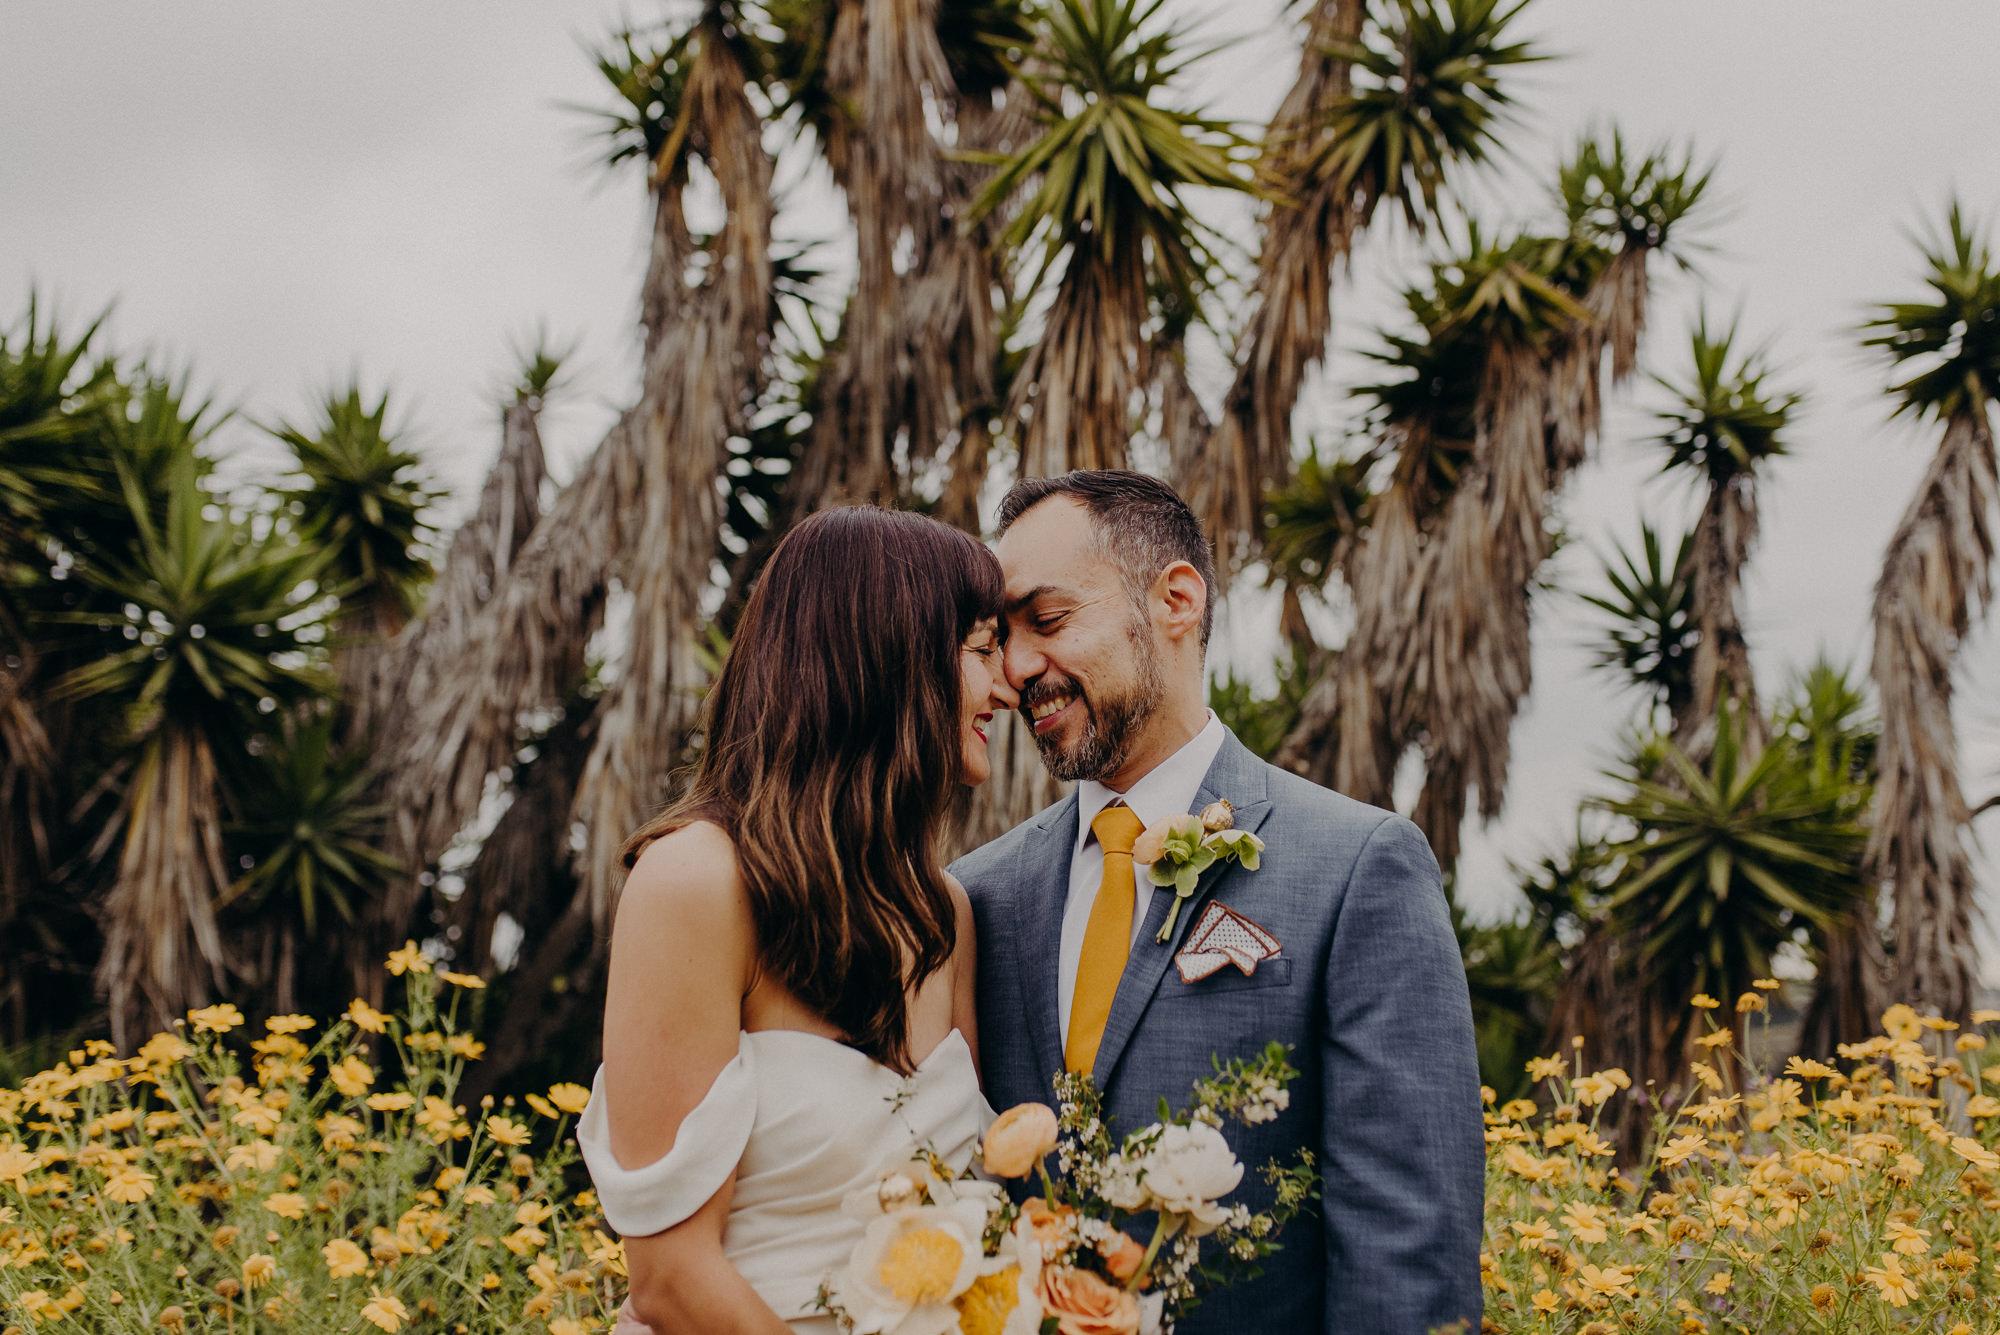 elopement photographer in los angeles - la wedding photographer - isaiahandtaylor.com-030.jpg